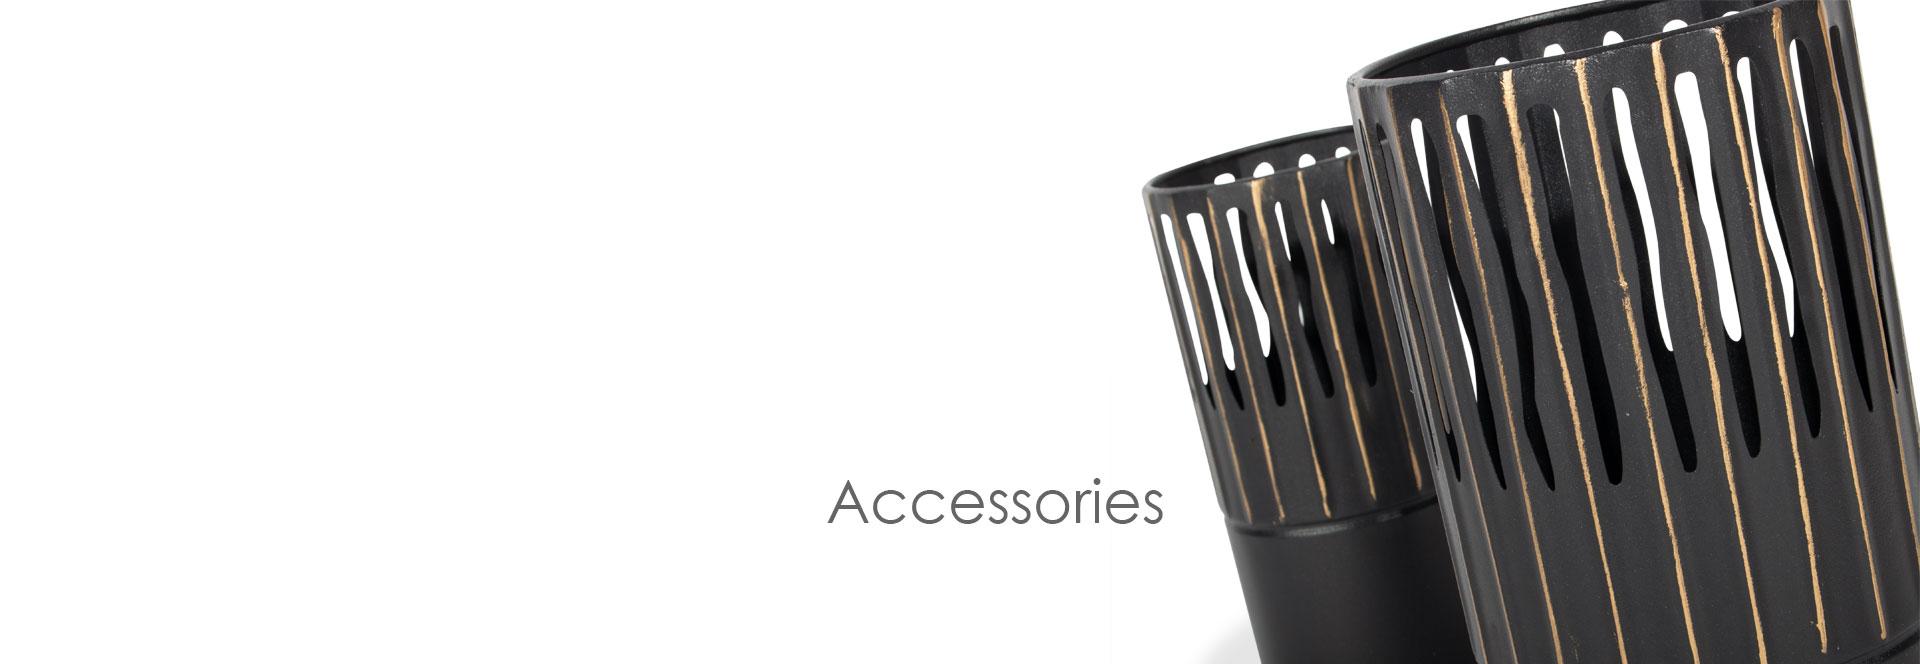 Accessories - All